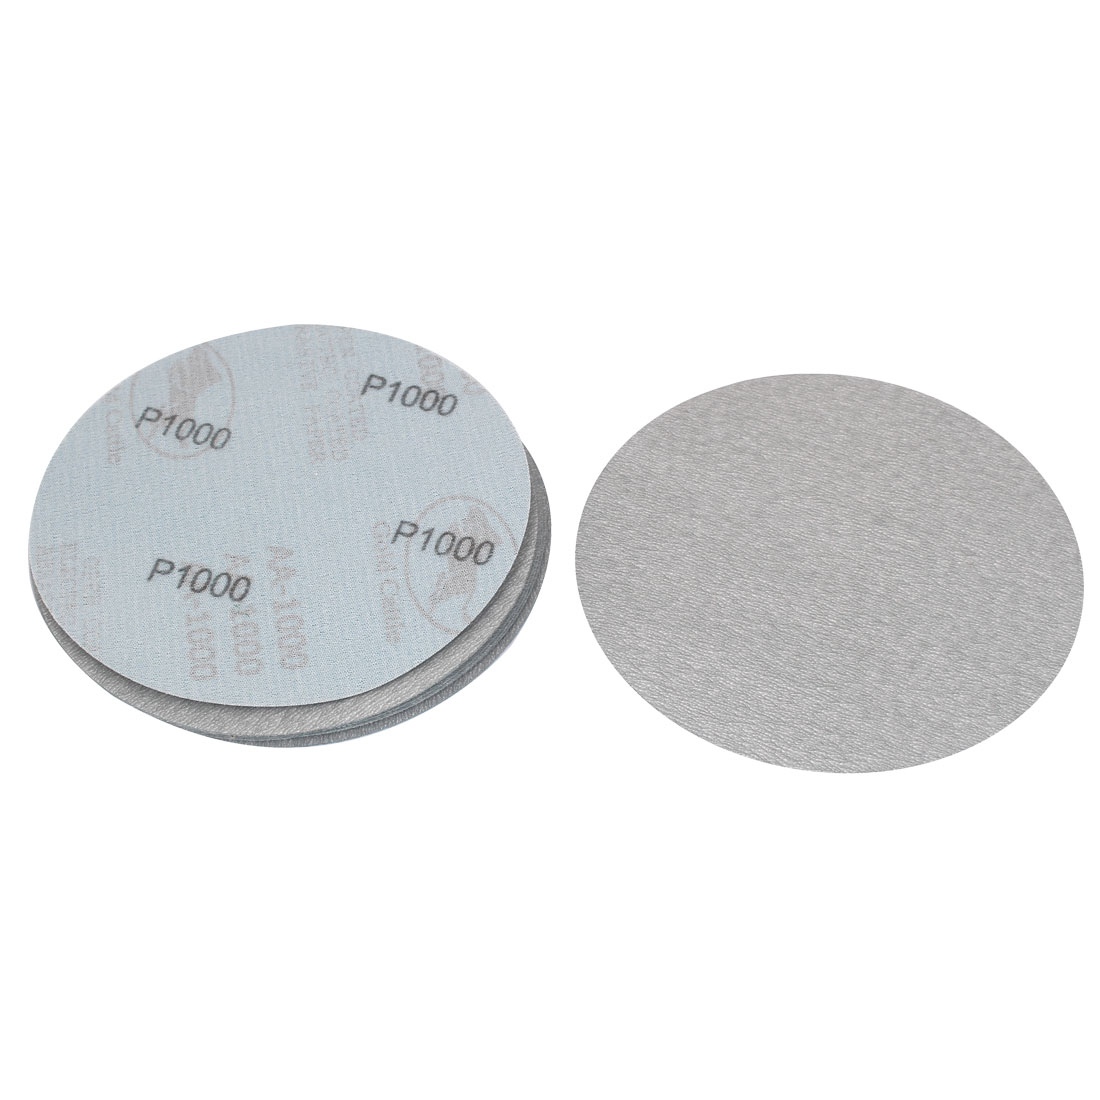 "6"" Dia Polishing Round Dry Abrasive Sanding Sandpaper Sheet Disc 1000 Grit 10 Pcs"